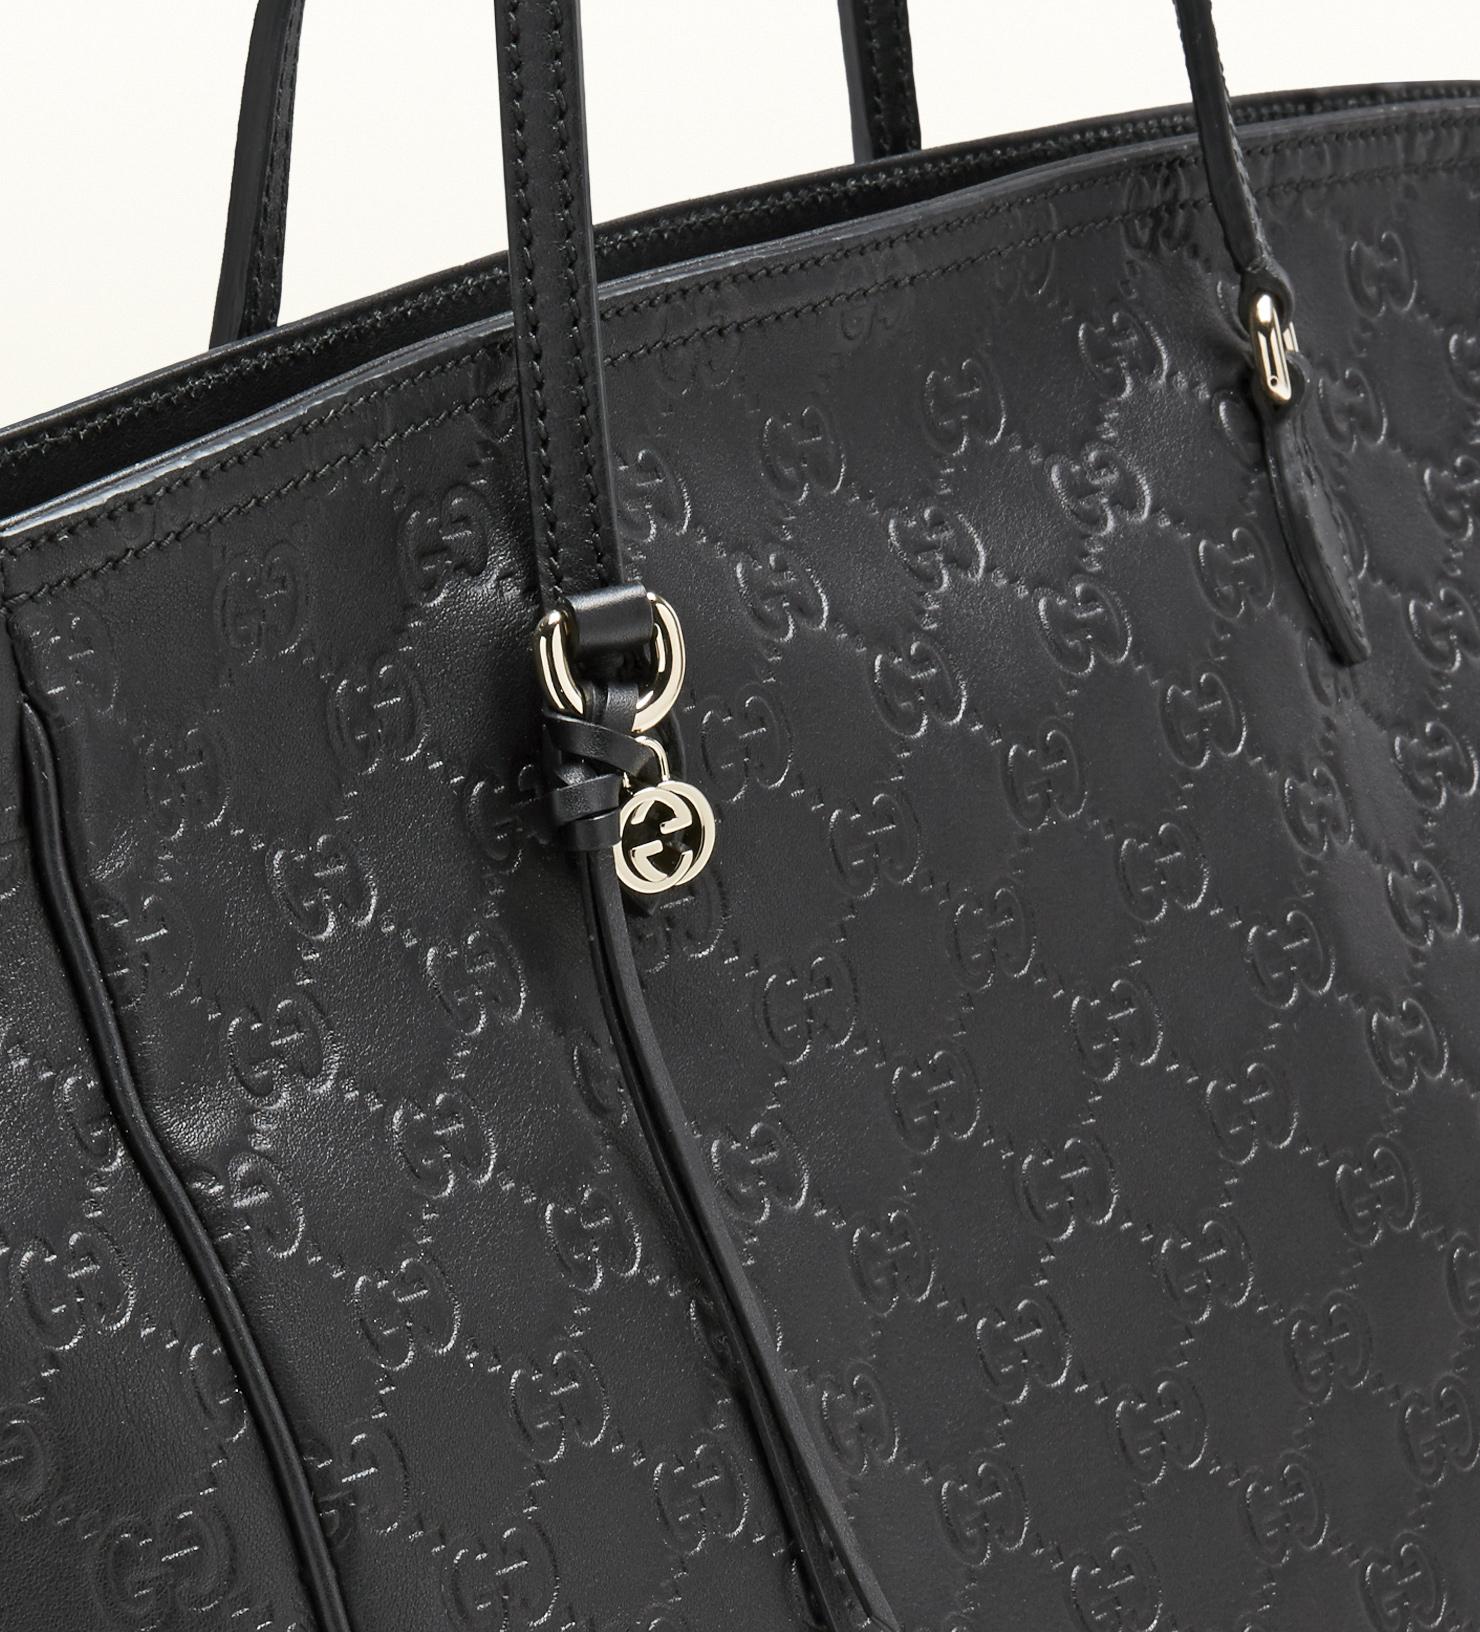 381305b46 Gucci Bree Ssima Leather Tote in Black - Lyst